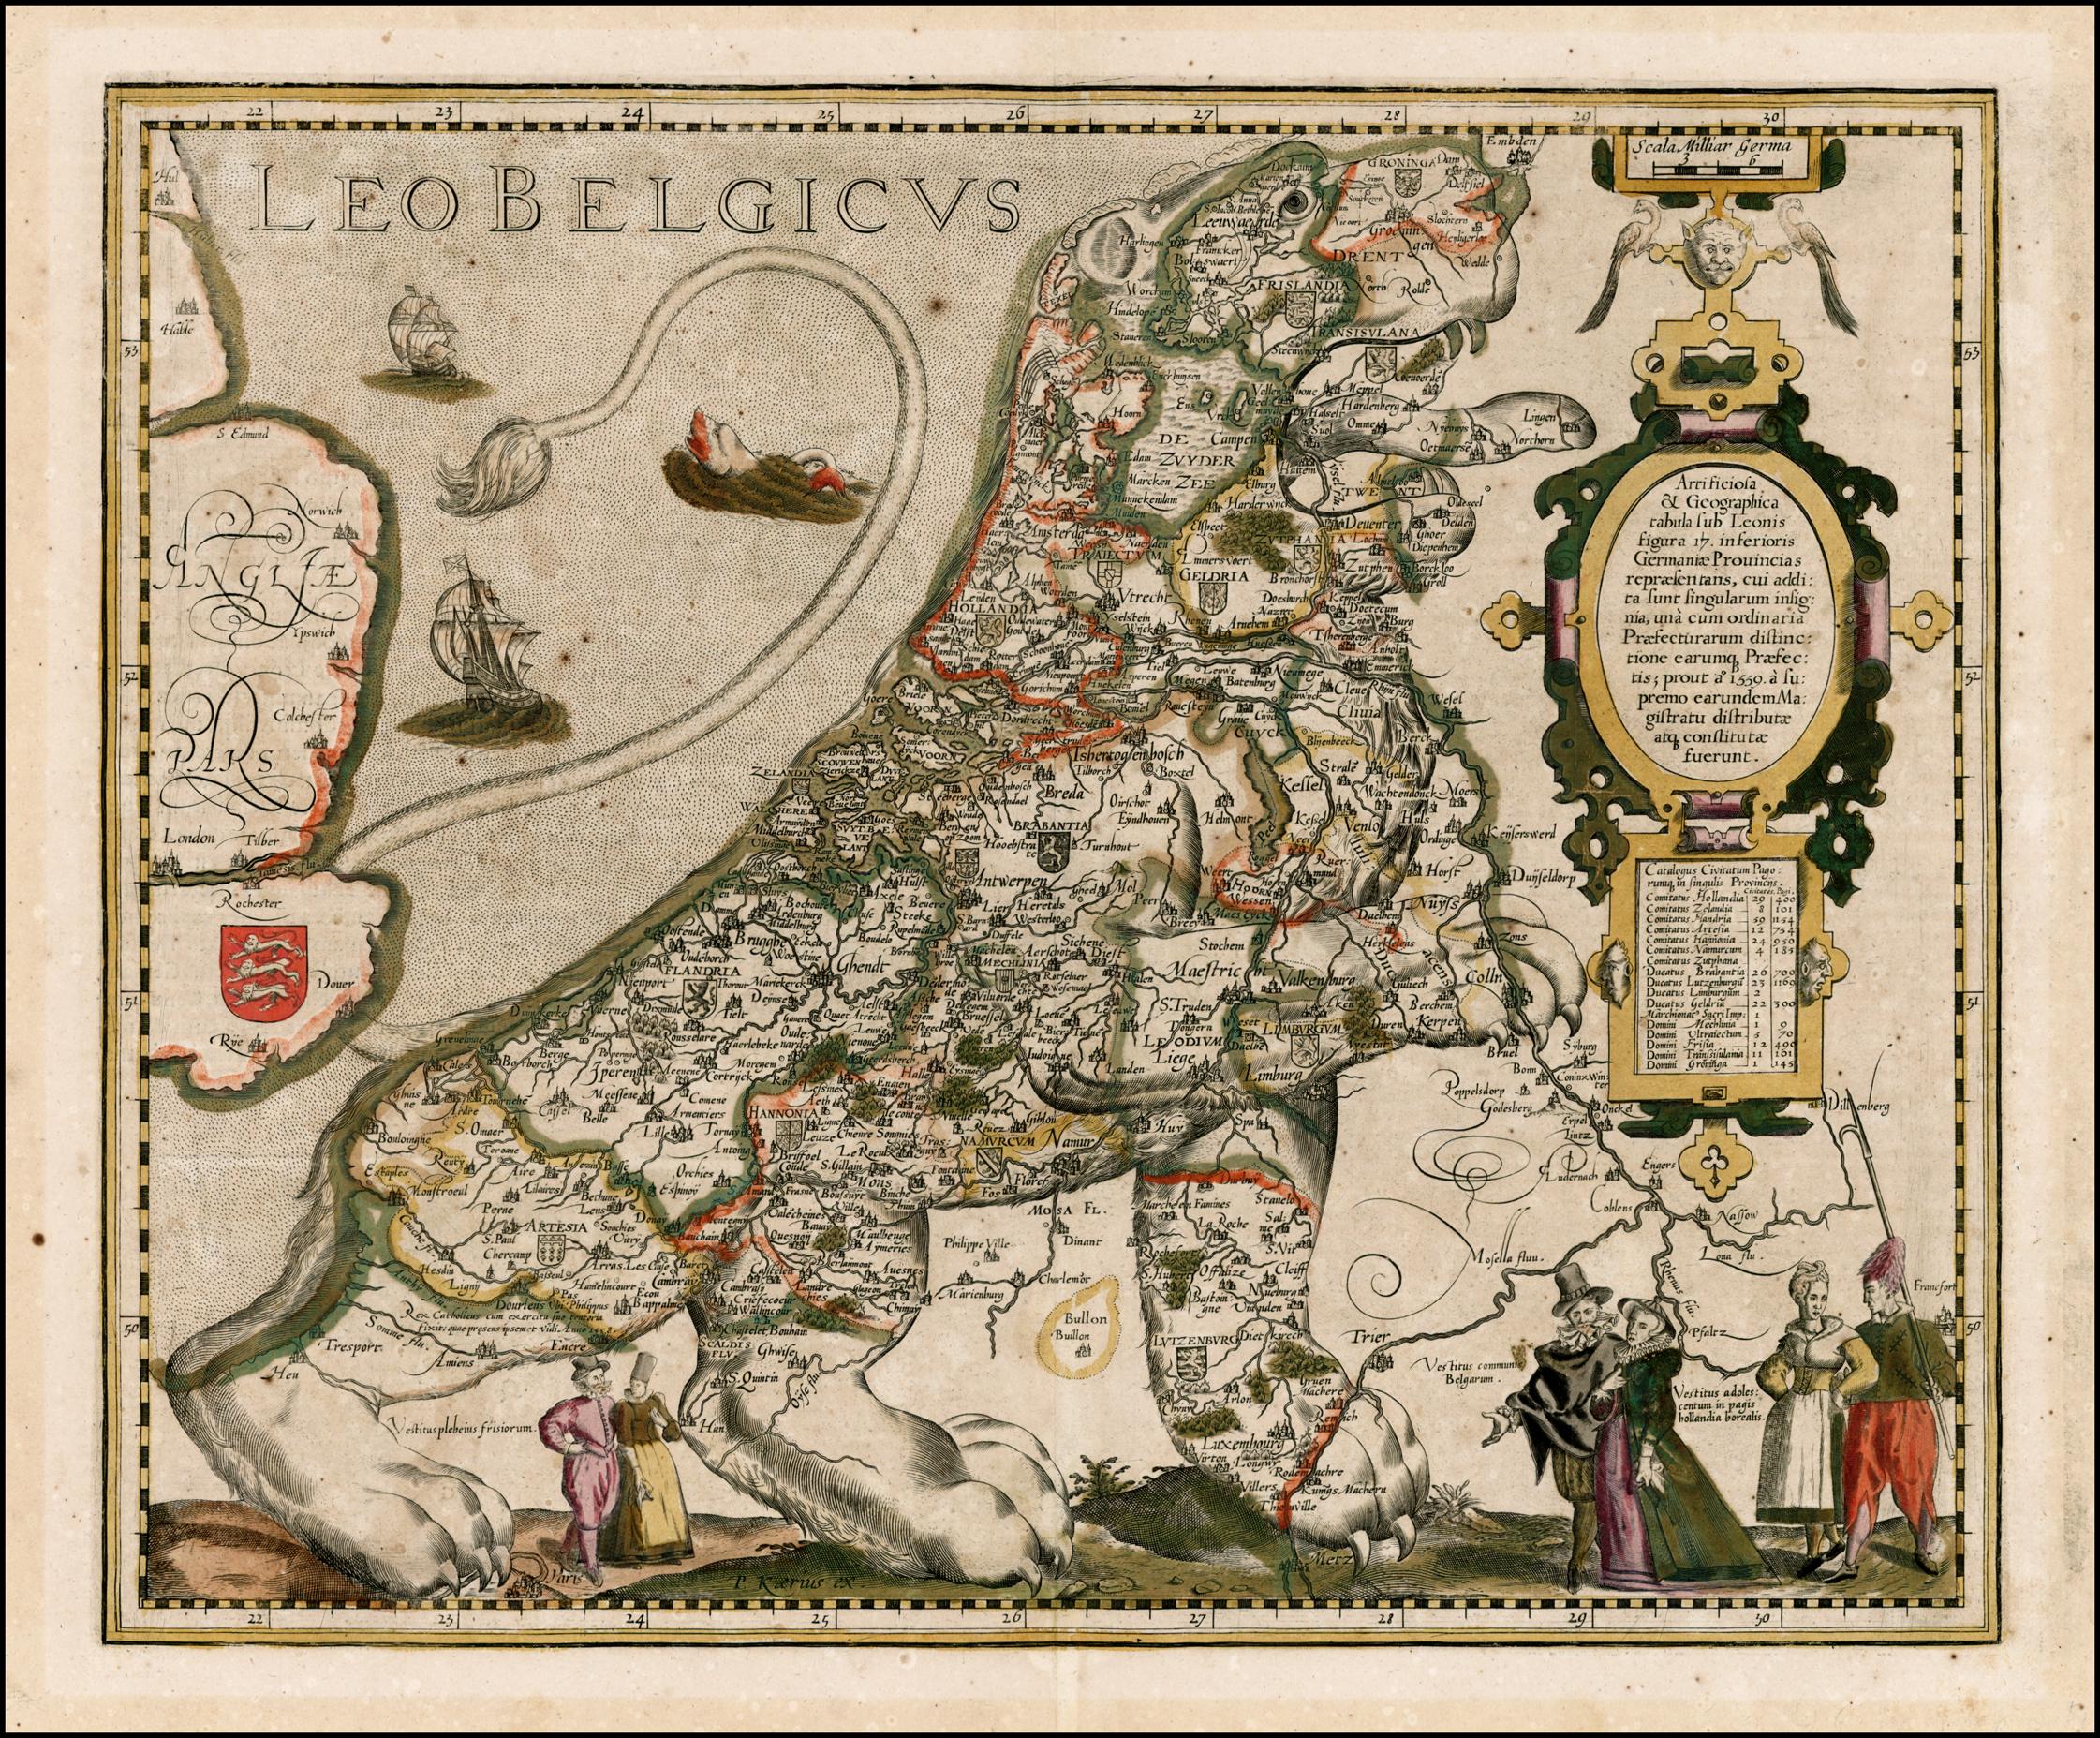 File:1617 Leo Belgicus Kaerius.jpg